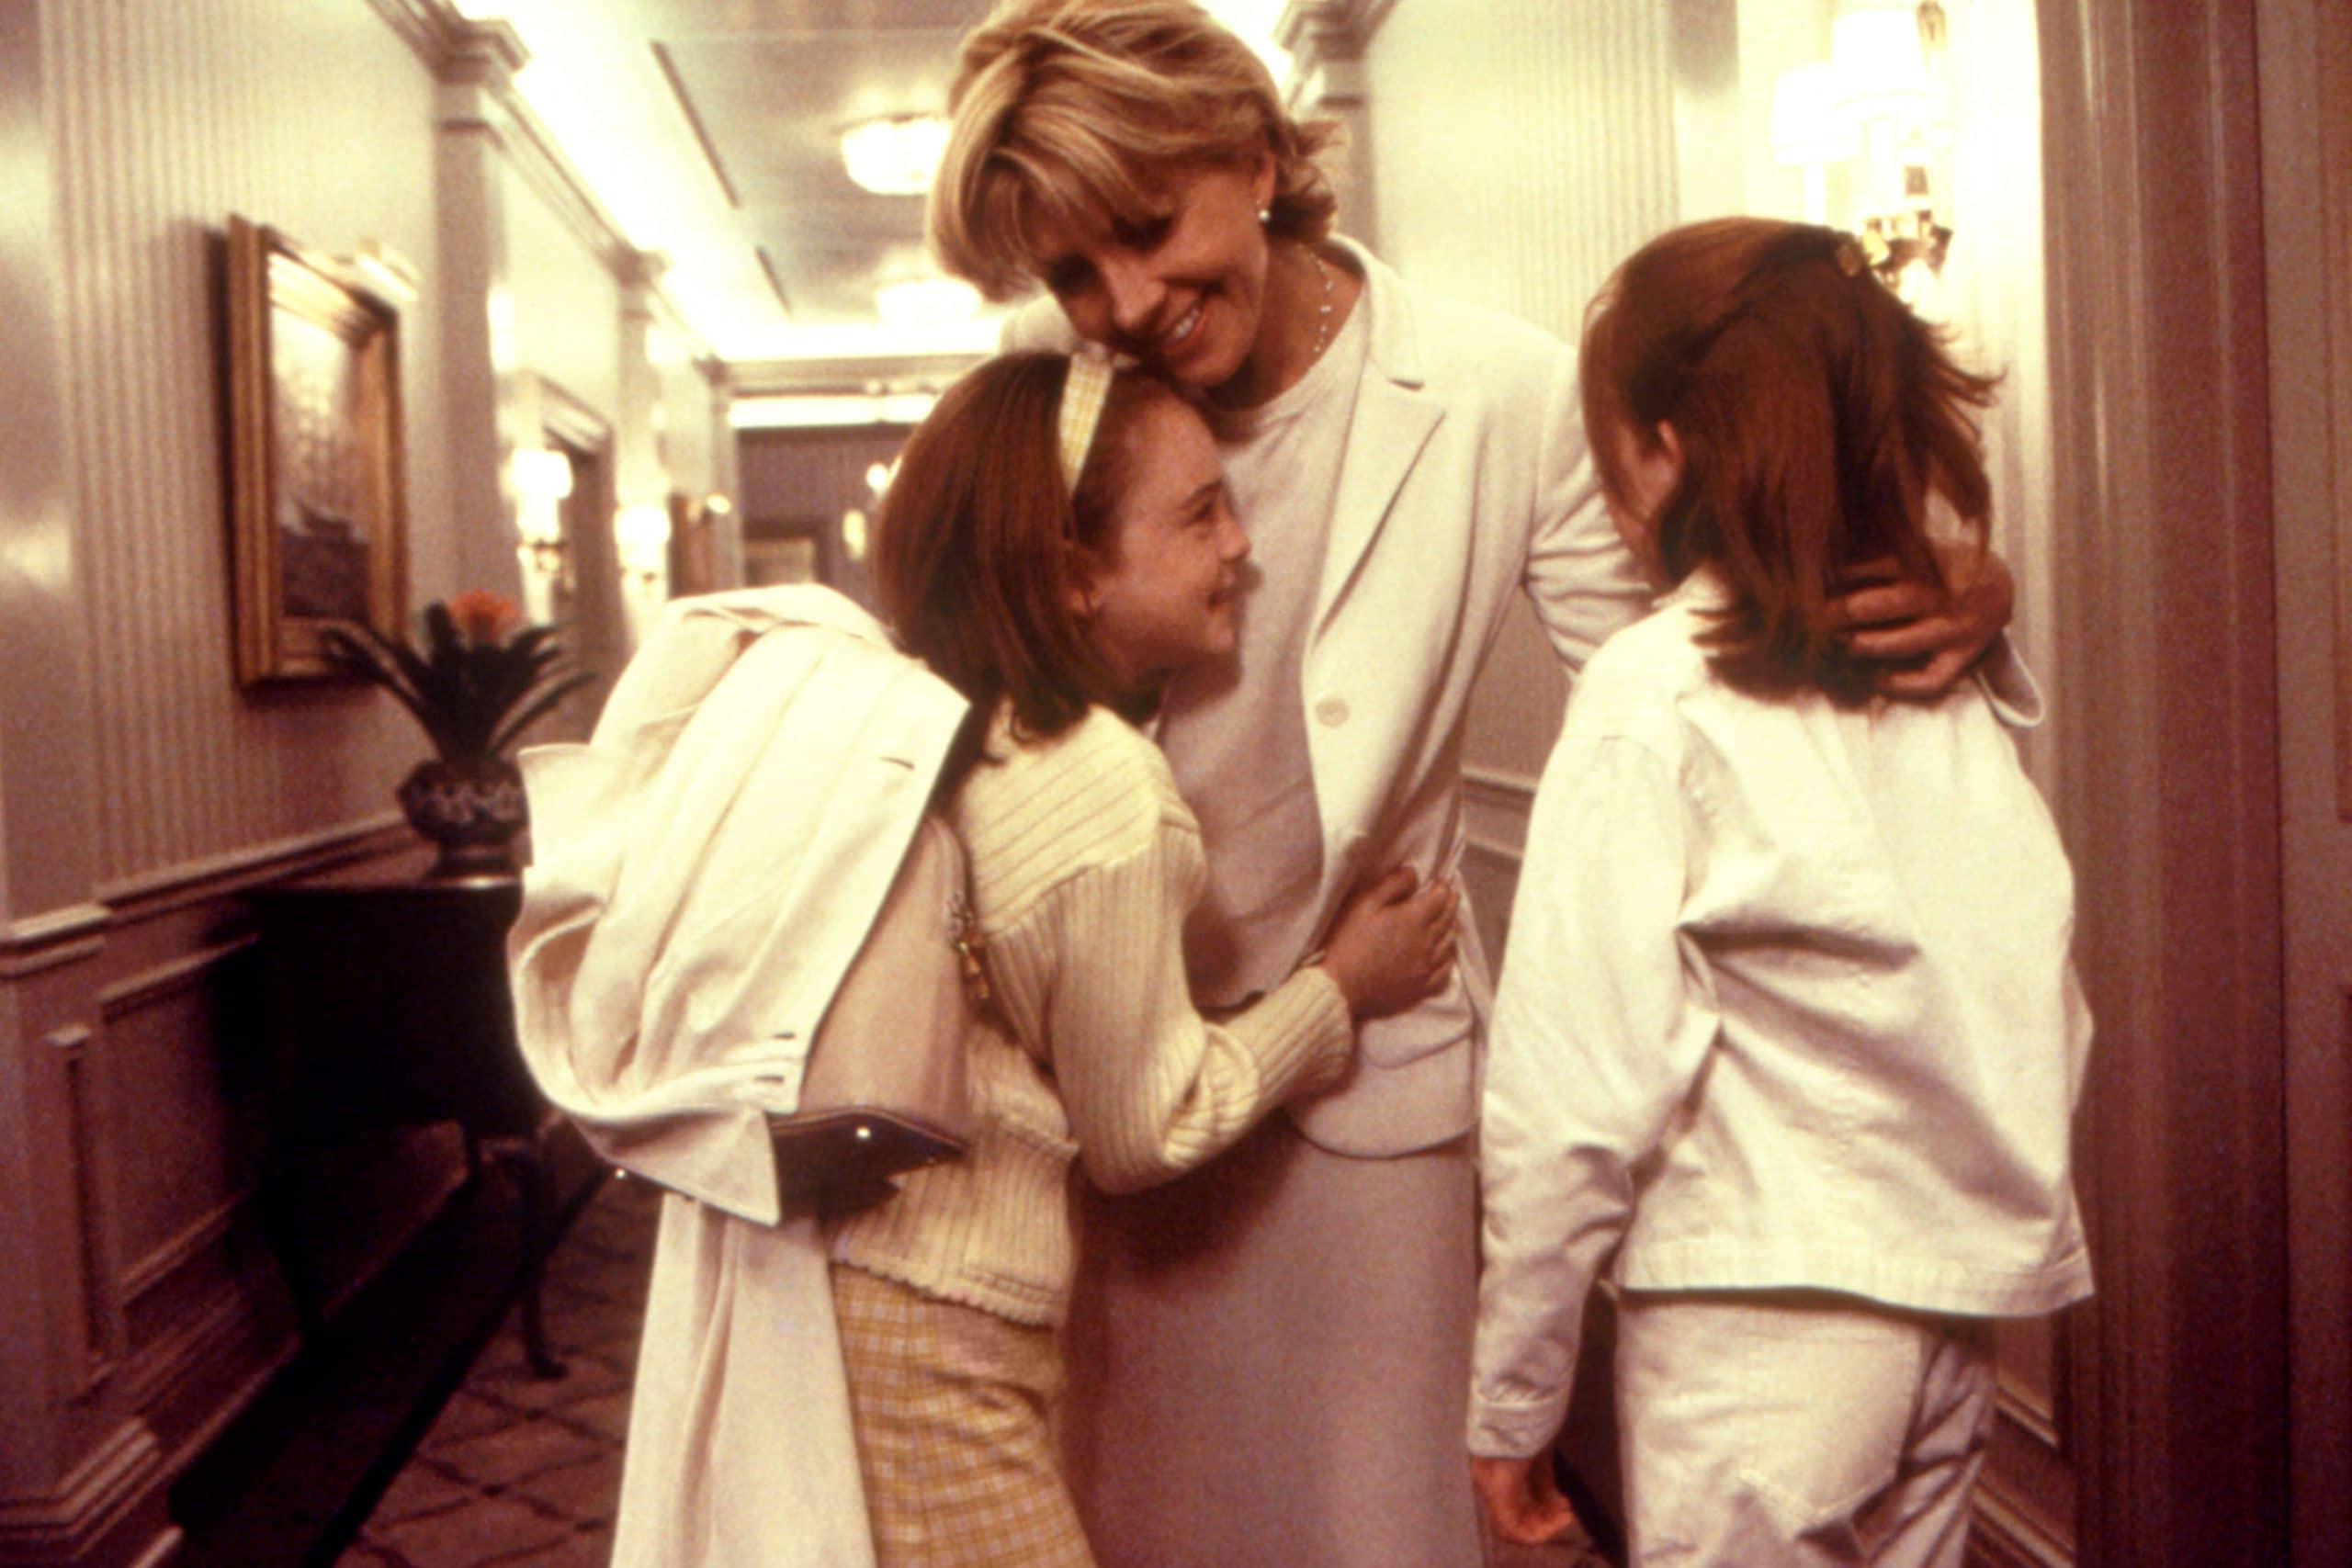 THE PARENT TRAP, Lindsay Lohan, Natasha Richardson, 1998